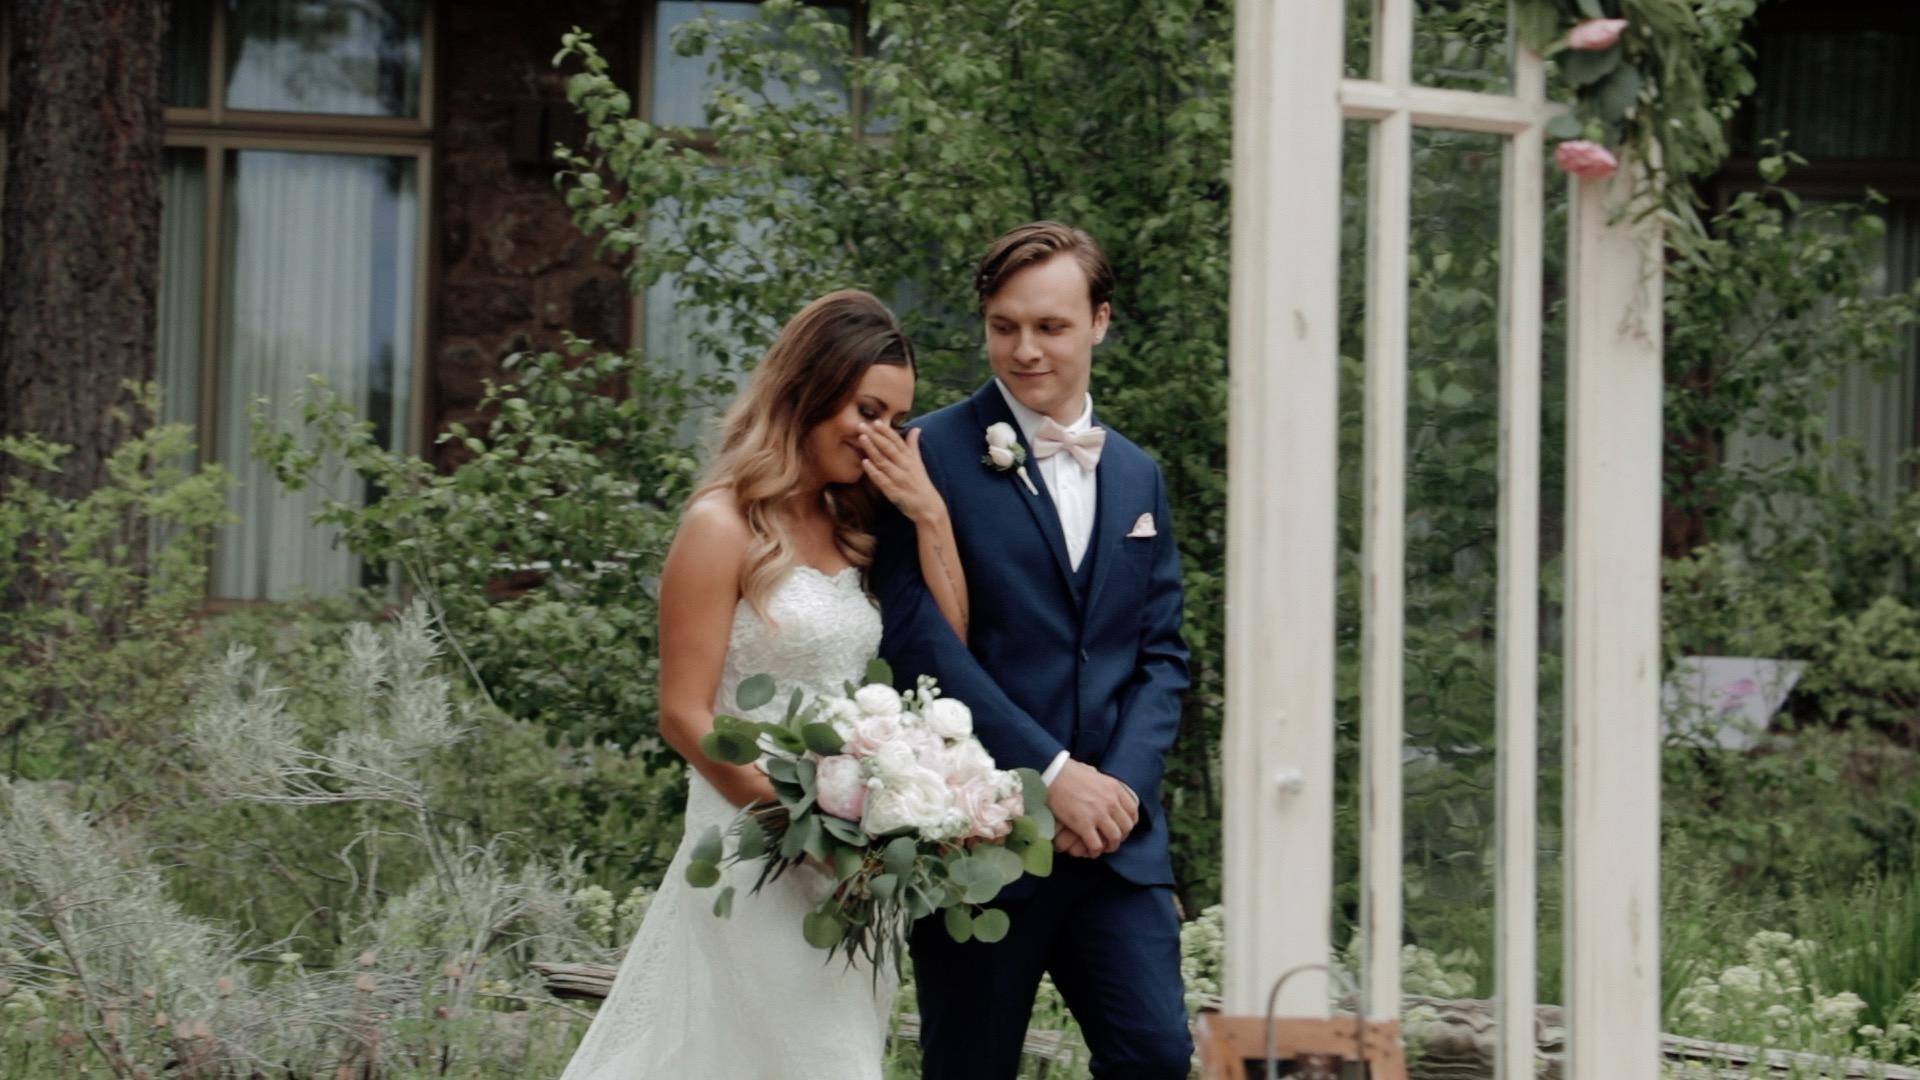 Arboretum at Flagstaff wedding